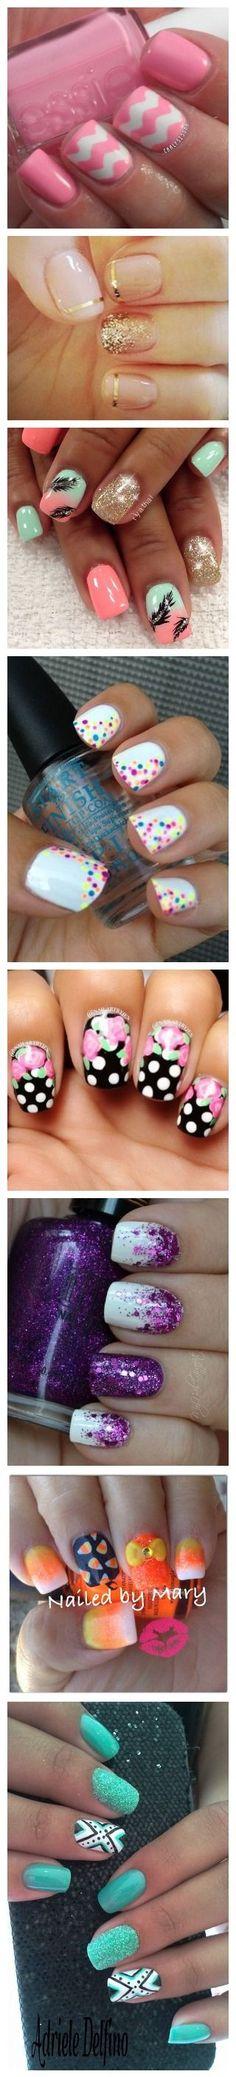 Nail Art Ideas and Designs